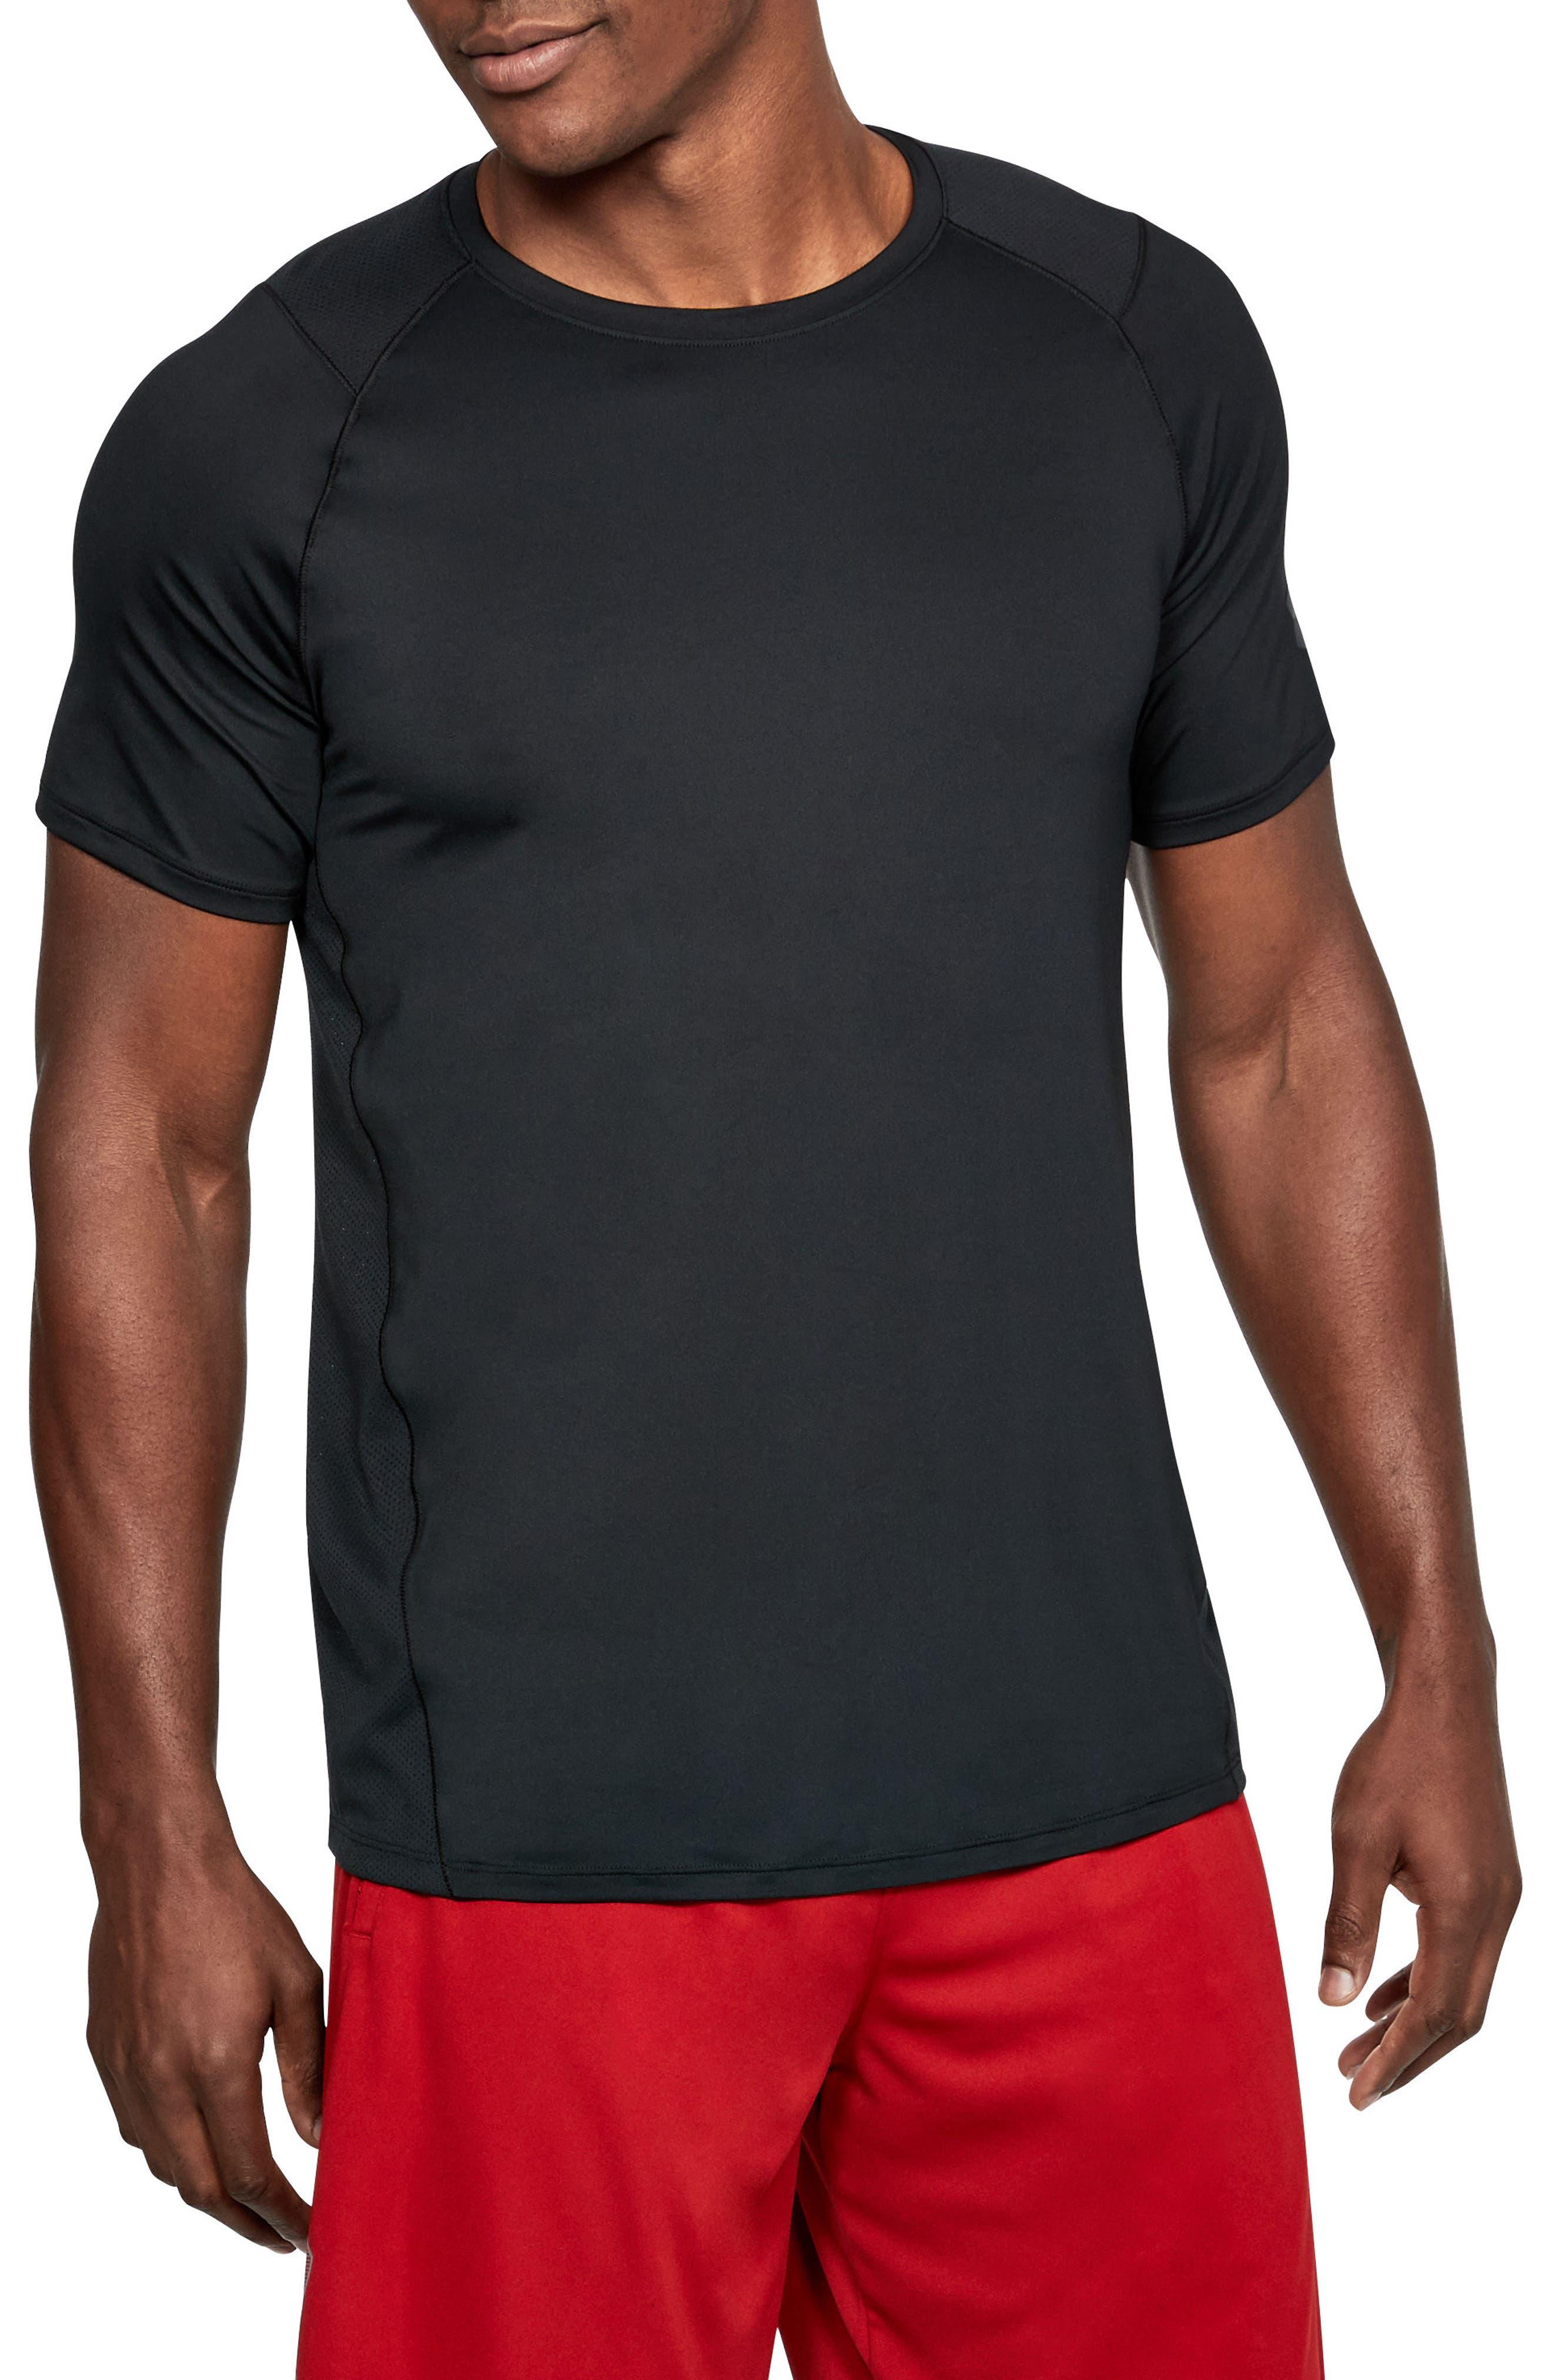 Raid 2.0 Crewneck T-Shirt,                         Main,                         color, 001